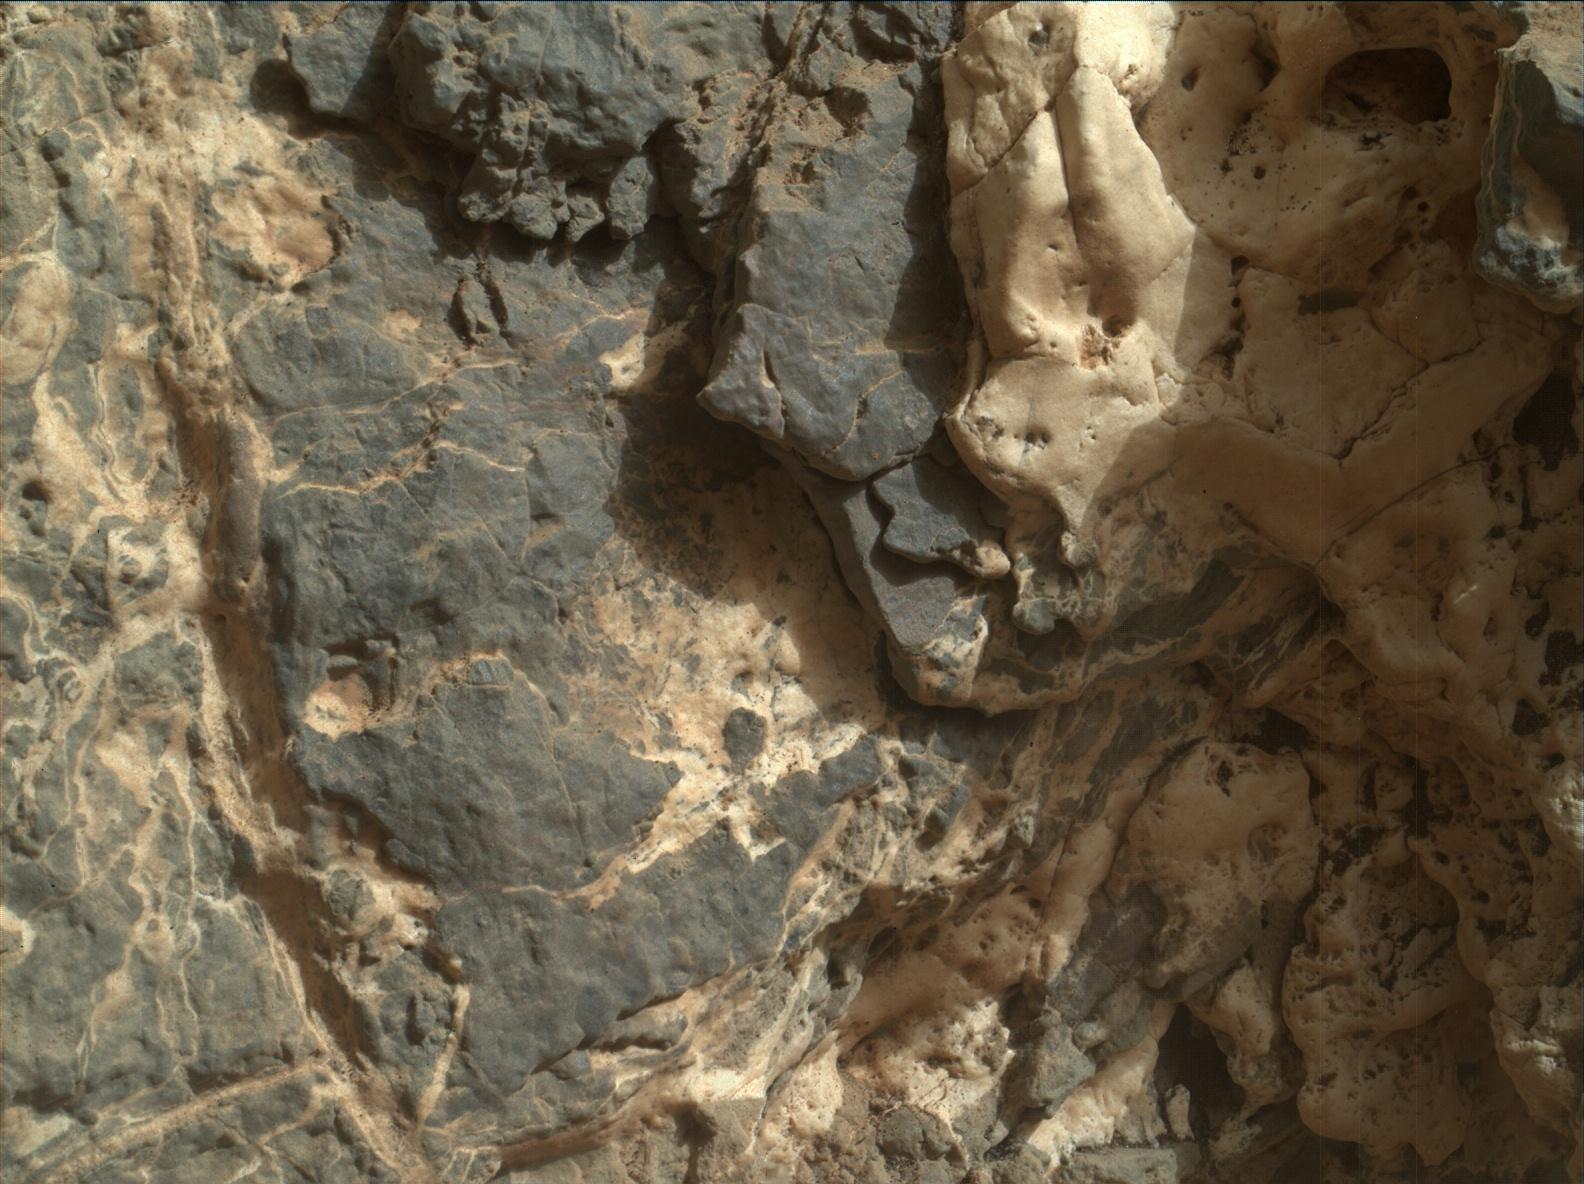 Sol 932 MAHLI image of veins